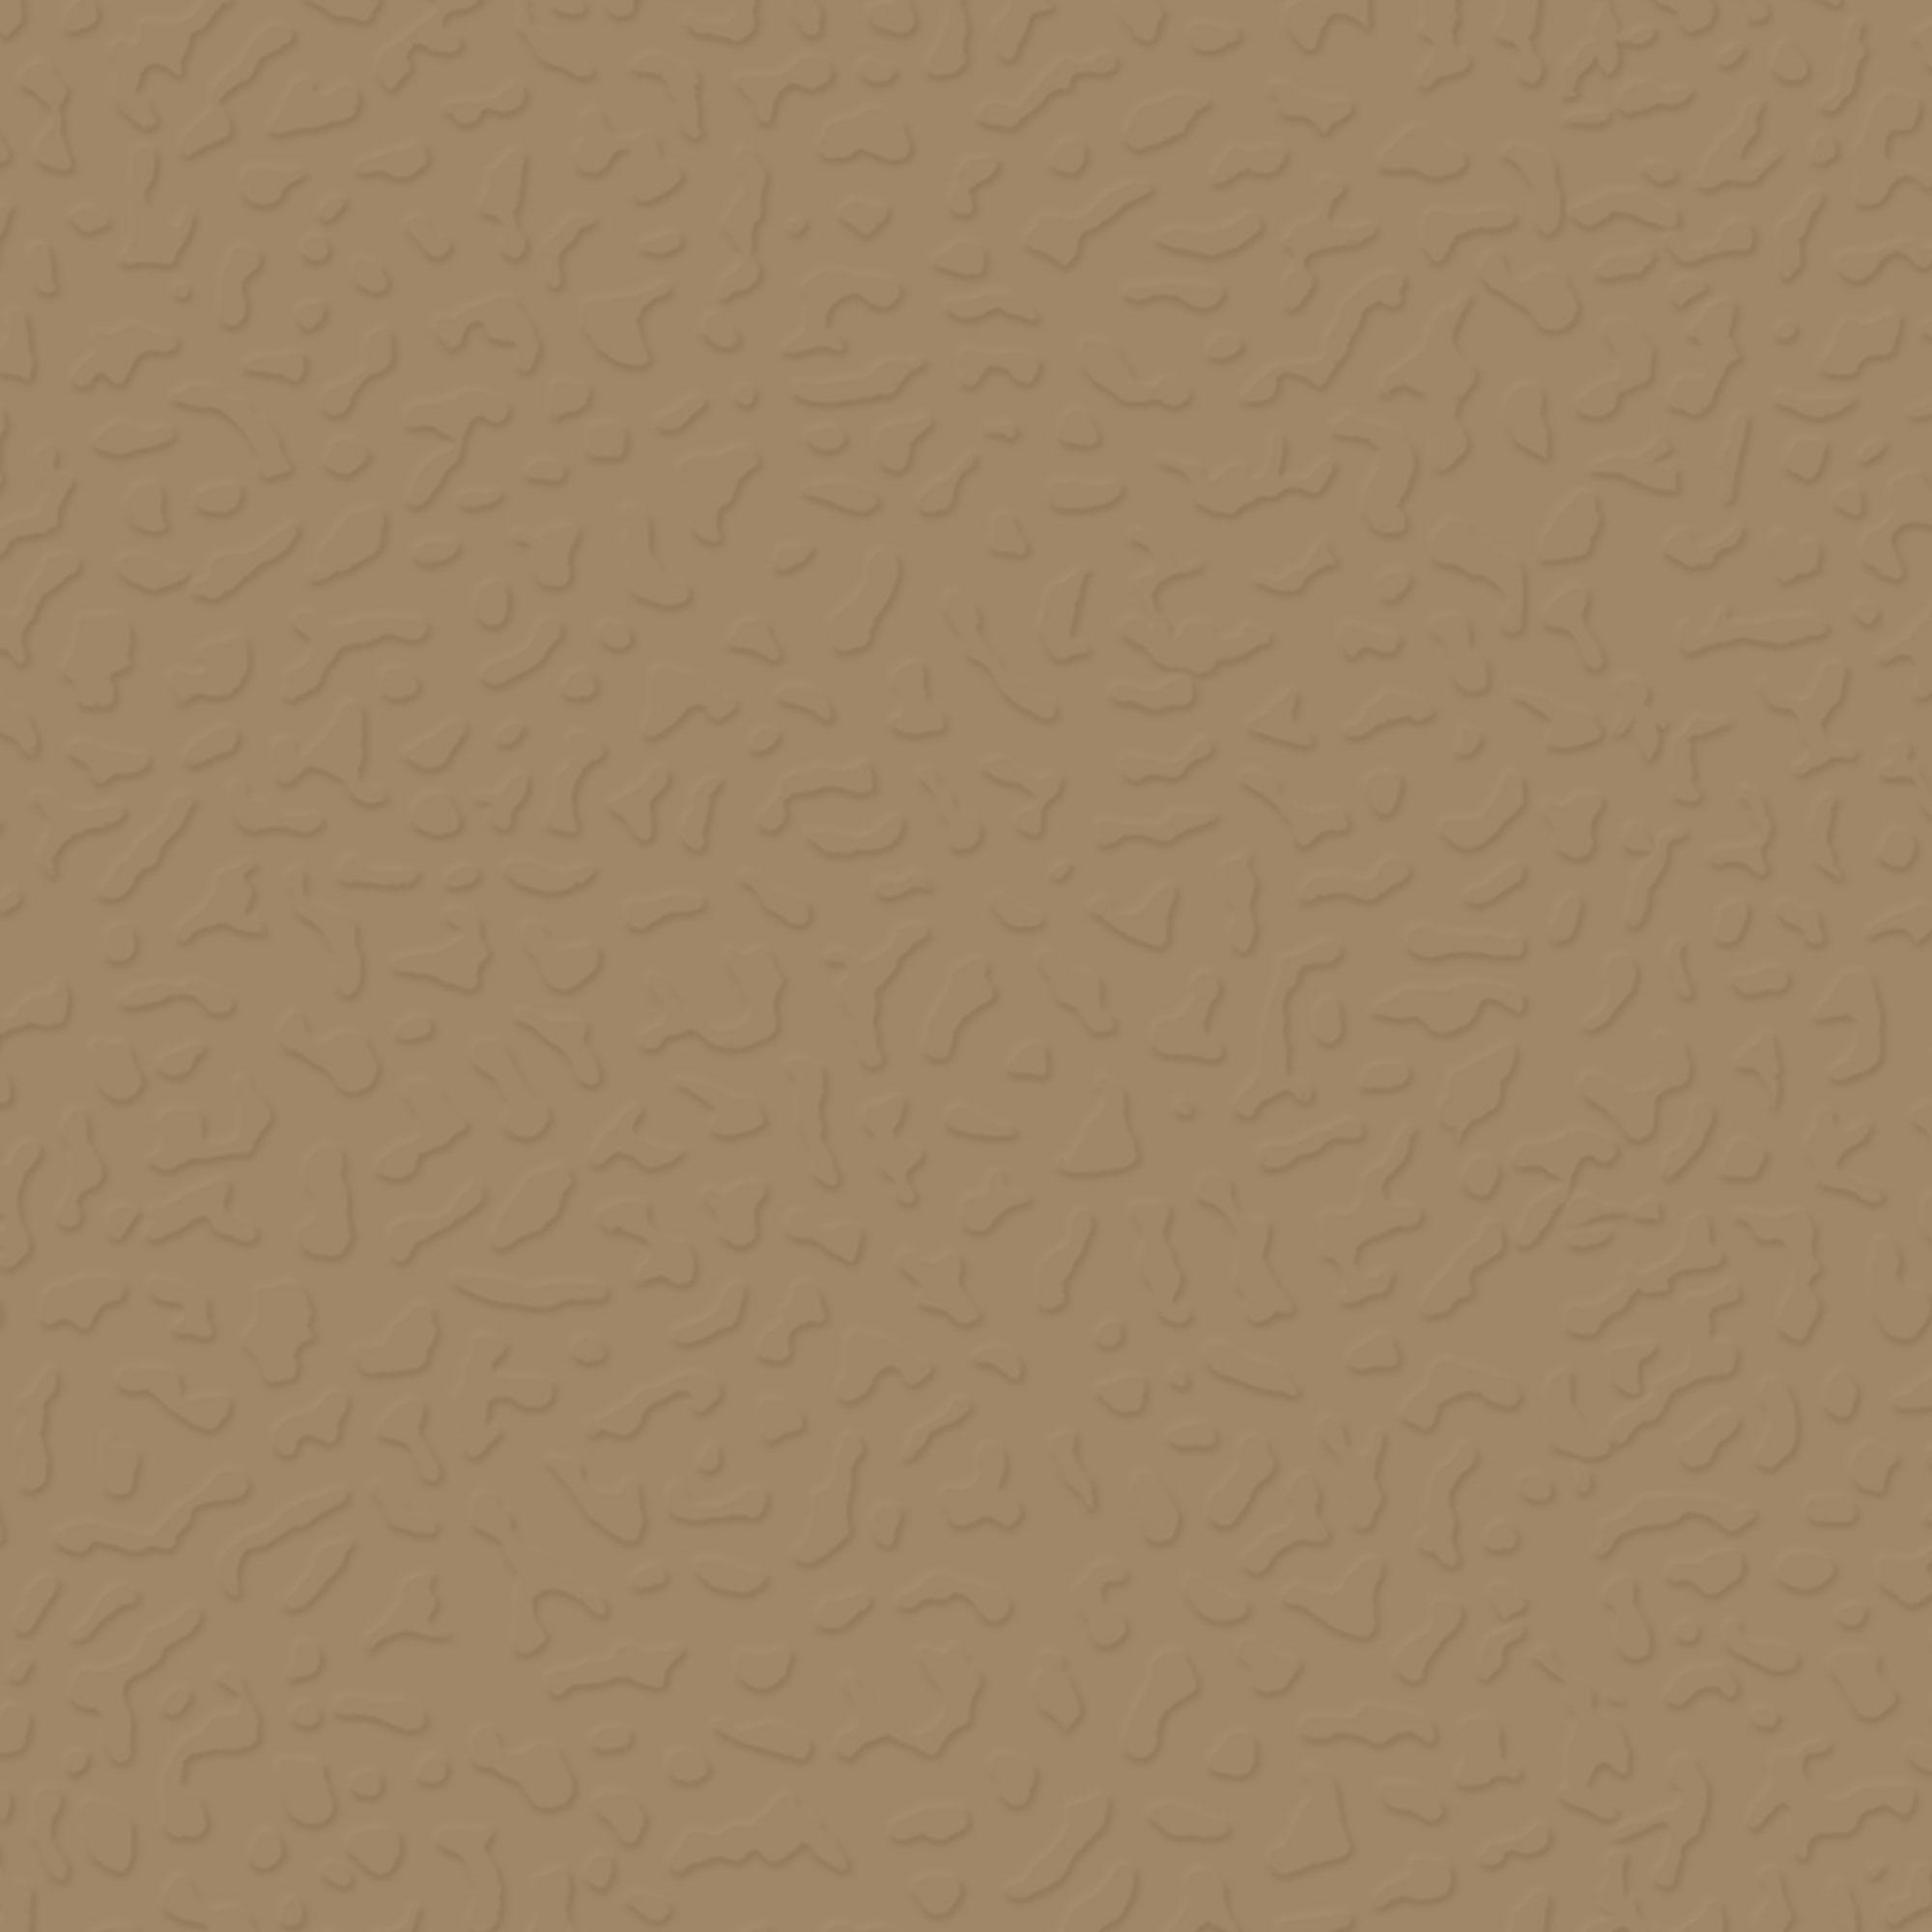 Roppe Rubber Tile 900 - Textured Design (993) Sahara Rubber Flooring